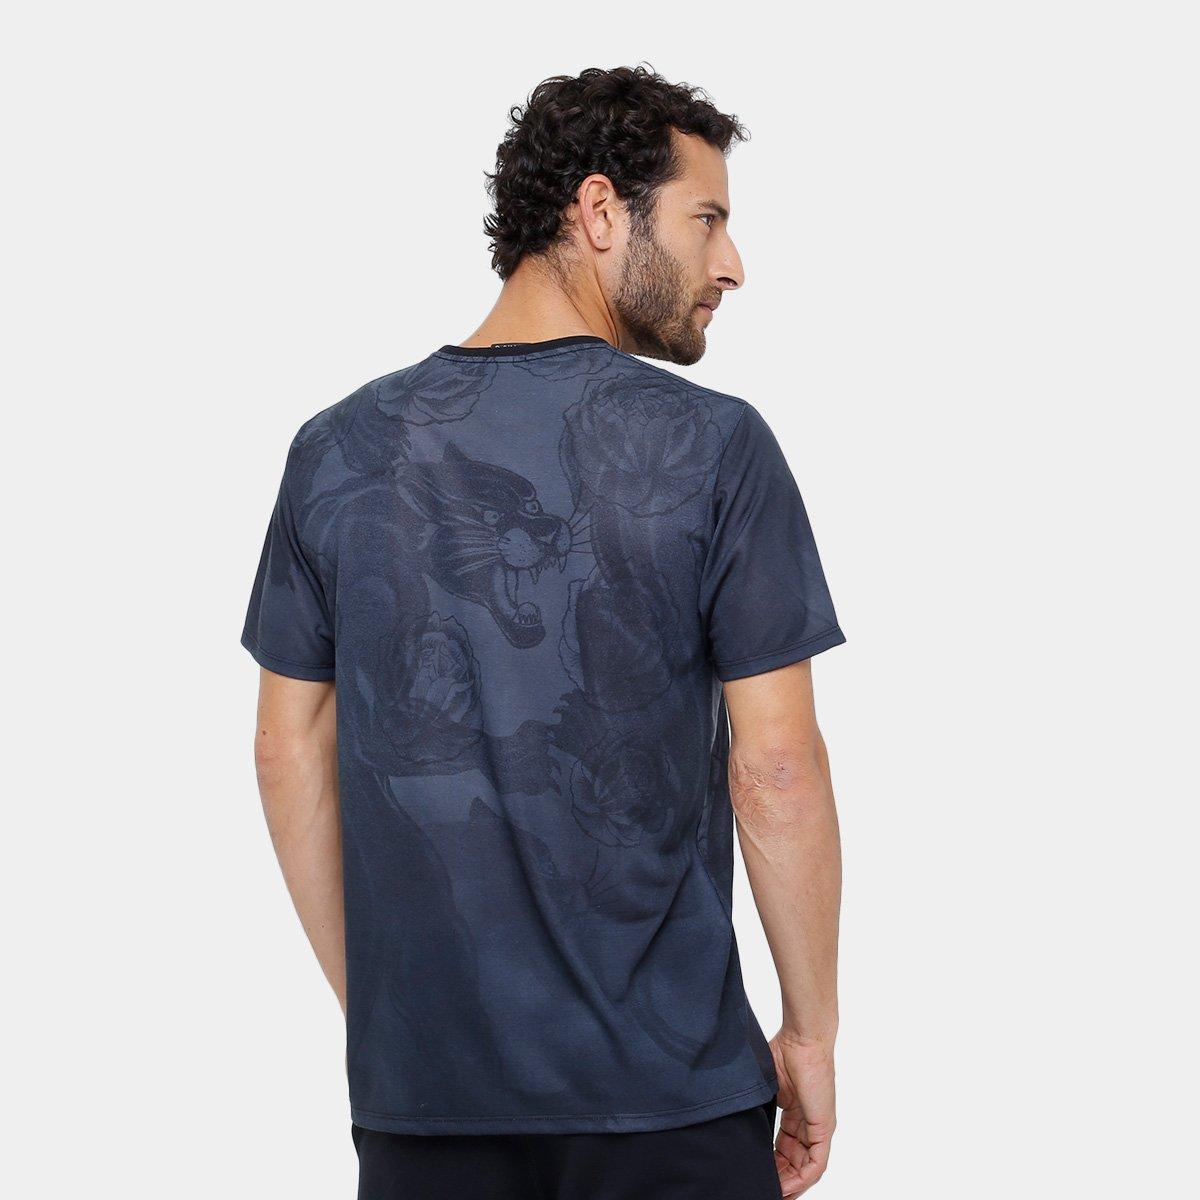 Camiseta MCD Especial Transfer Panther Masculina - Compre Agora ... 48b9138121f